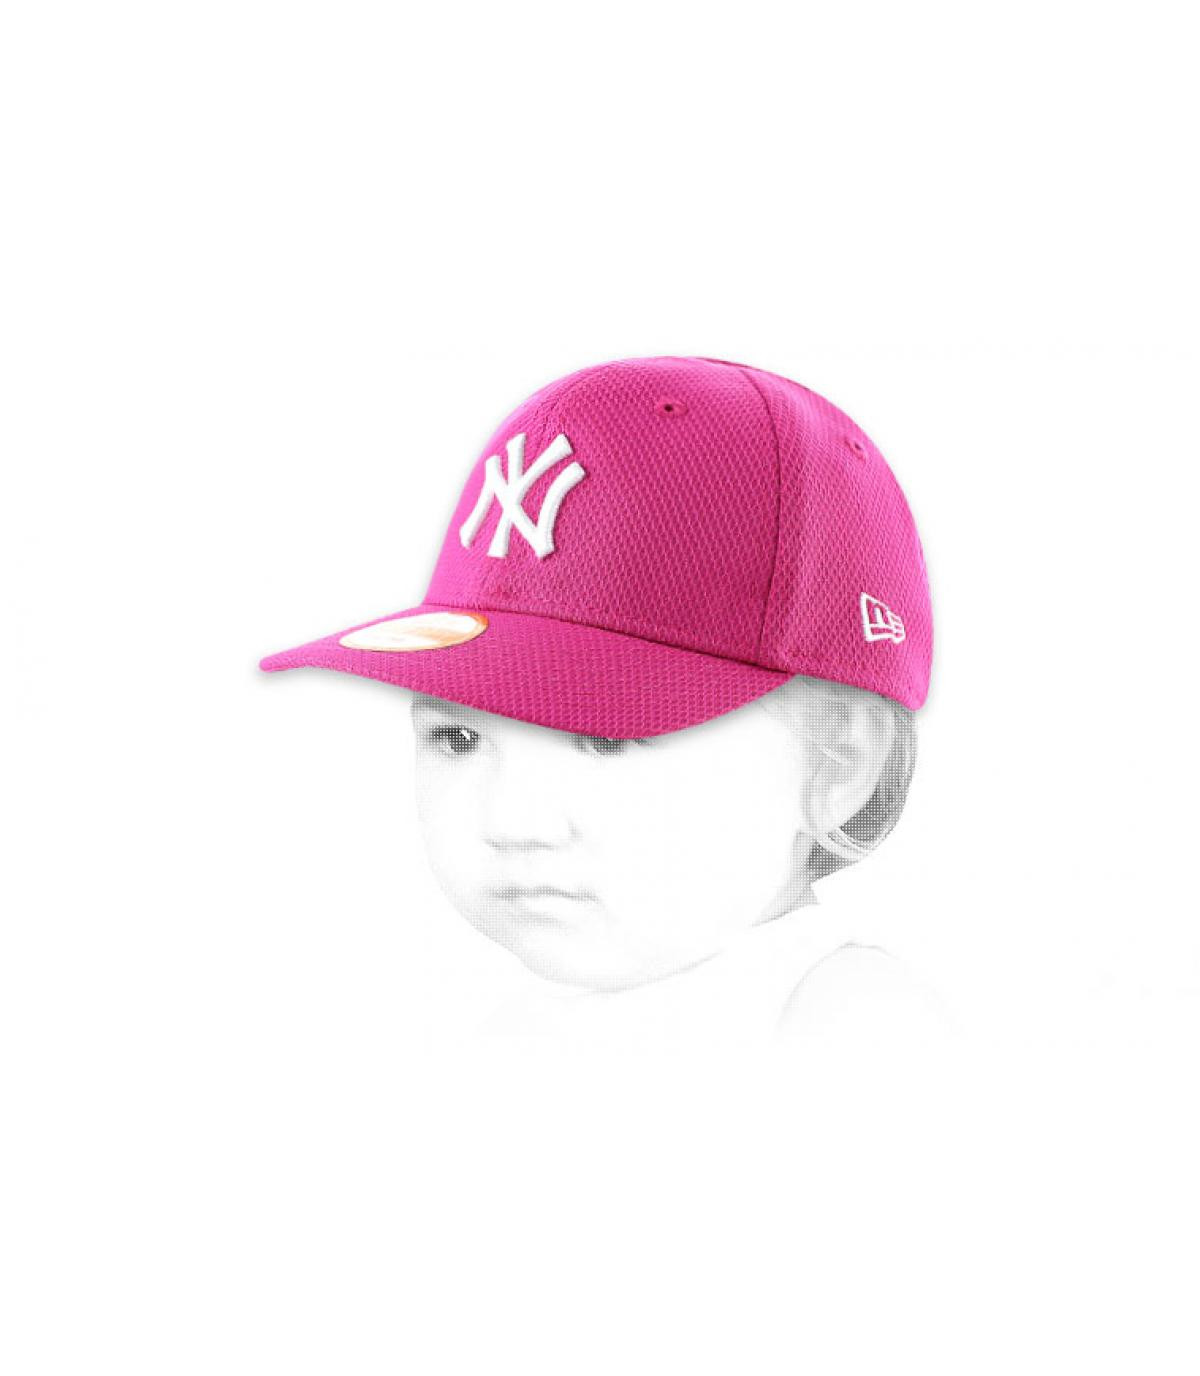 Casquette rose enfant